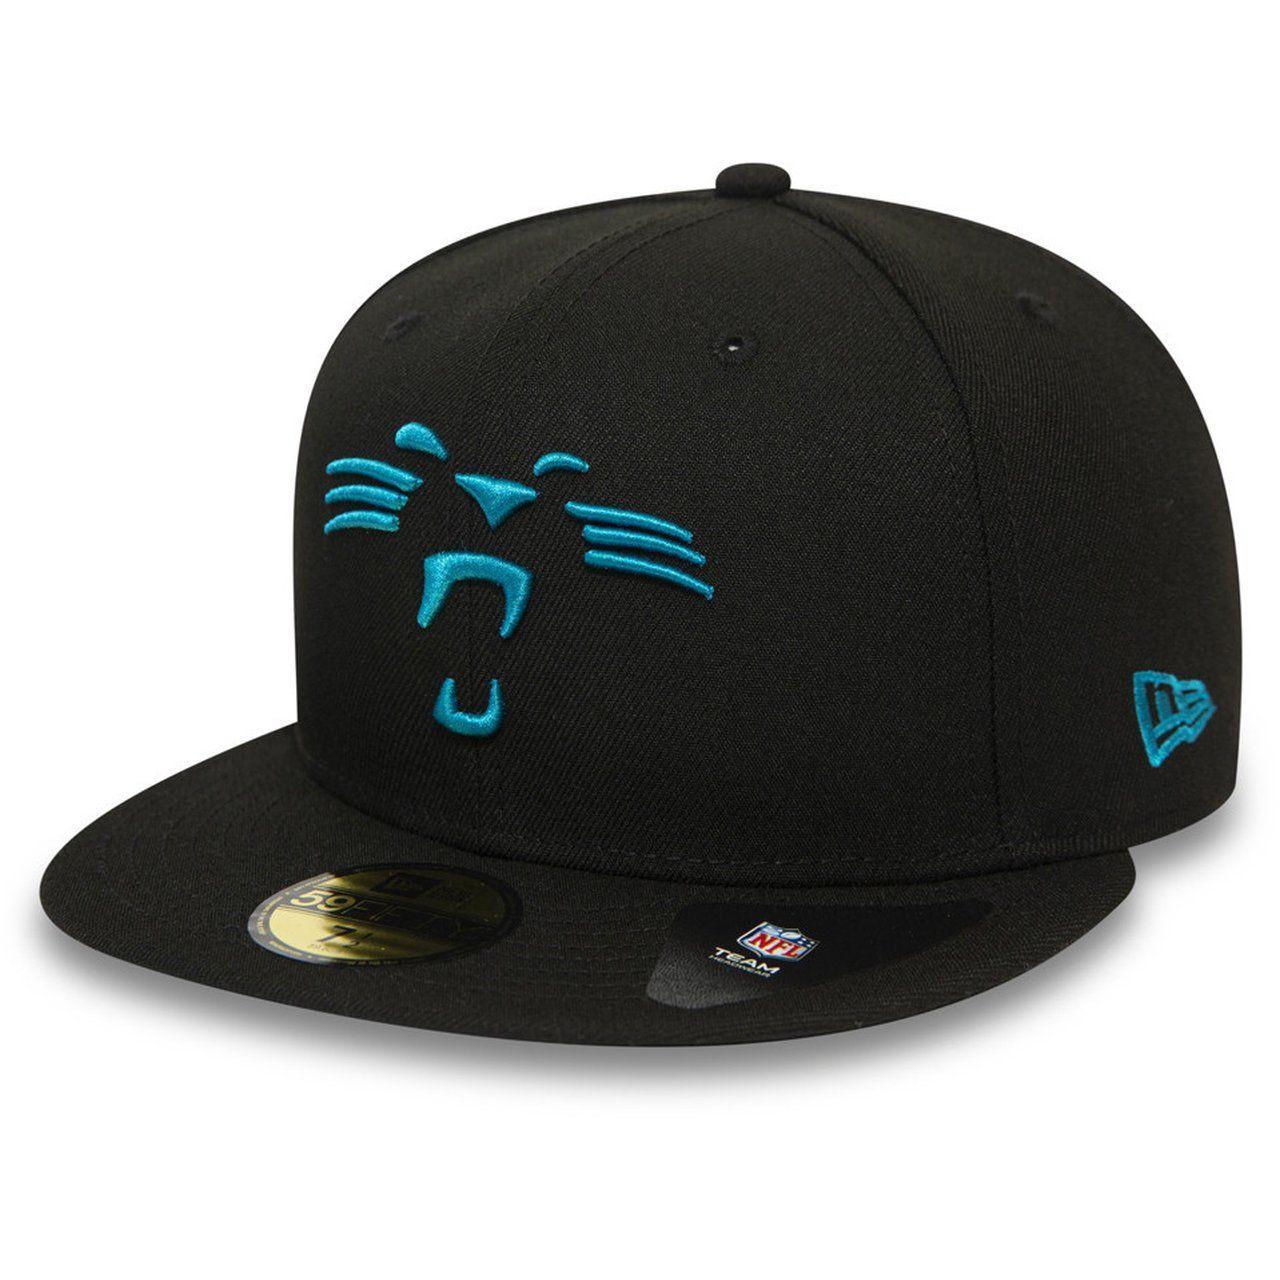 amfoo - New Era 59Fifty Fitted Cap - ELEMENTS Carolina Panthers